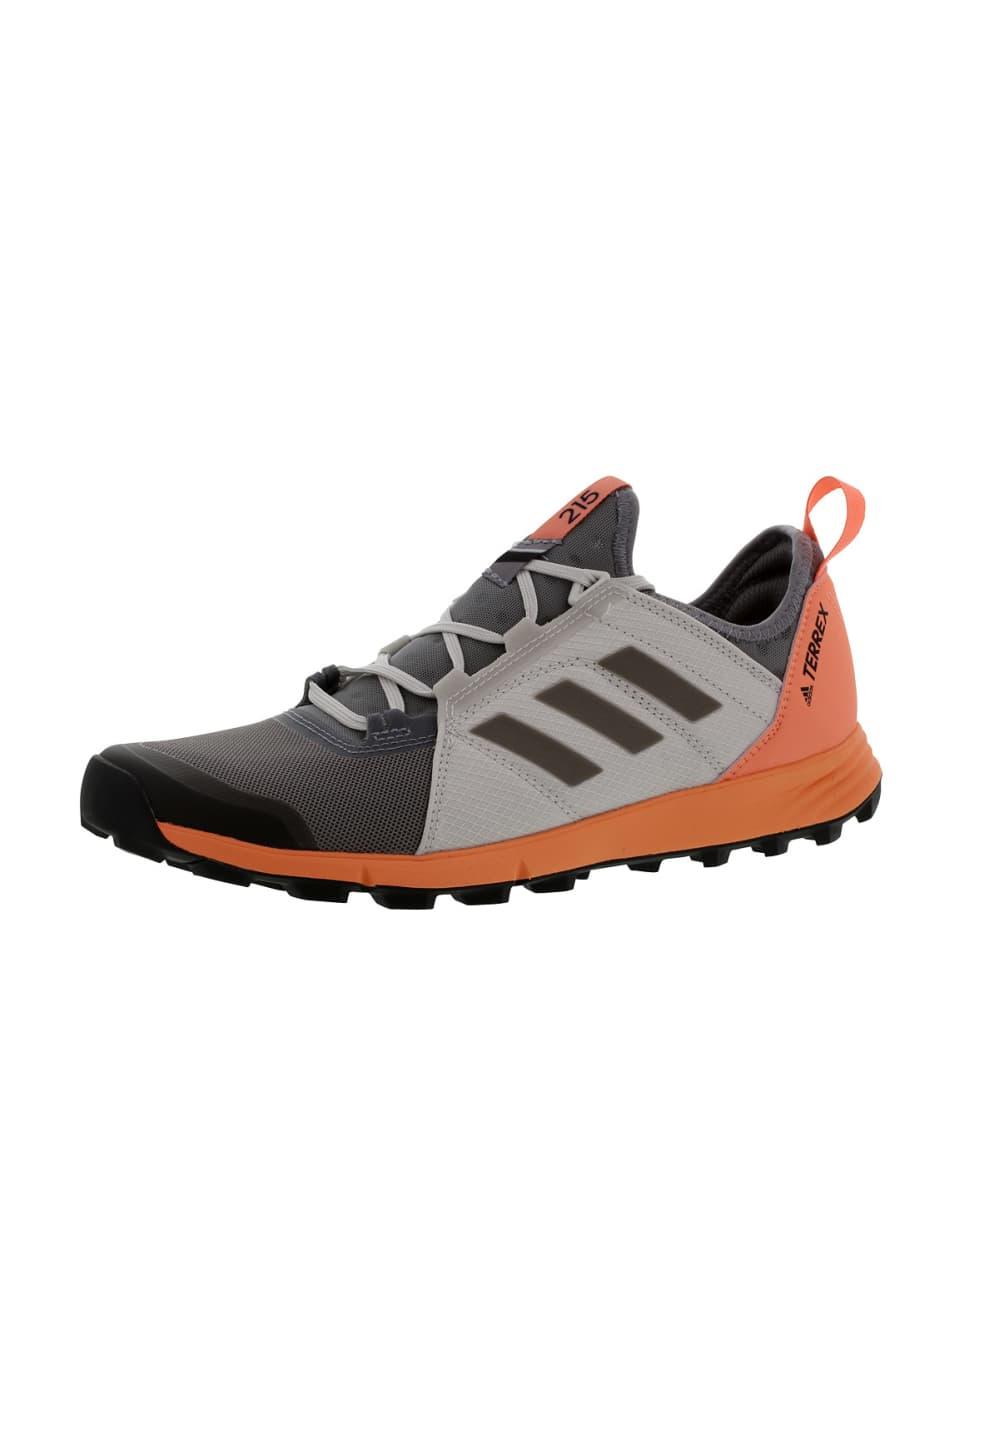 7de5580e722 adidas TERREX Terrex Agravic Speed - Running shoes for Women - Grey